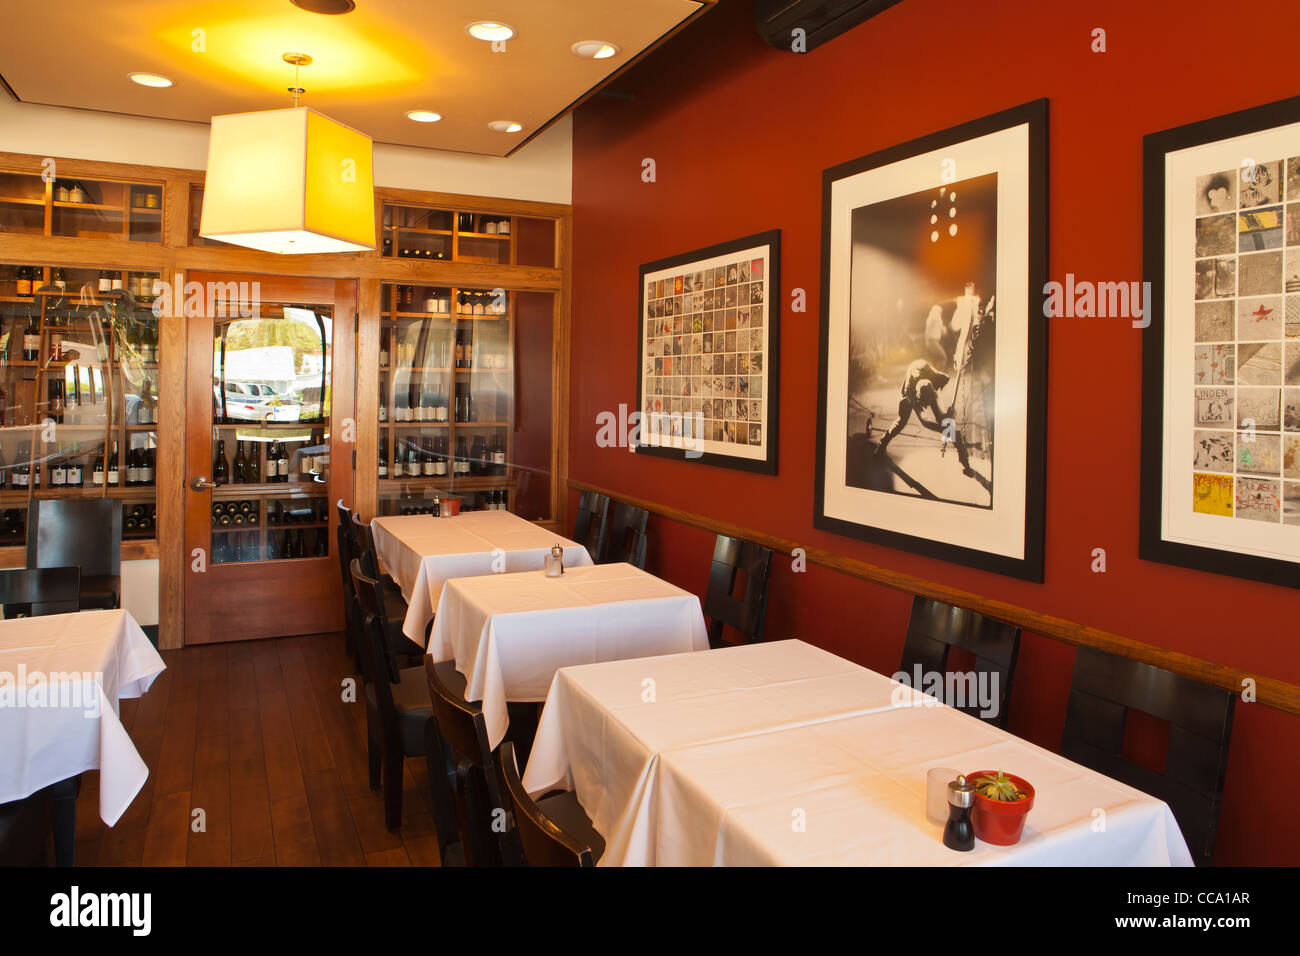 Artisan Restaurant, Paso Robles, California, United States of America - Stock Image